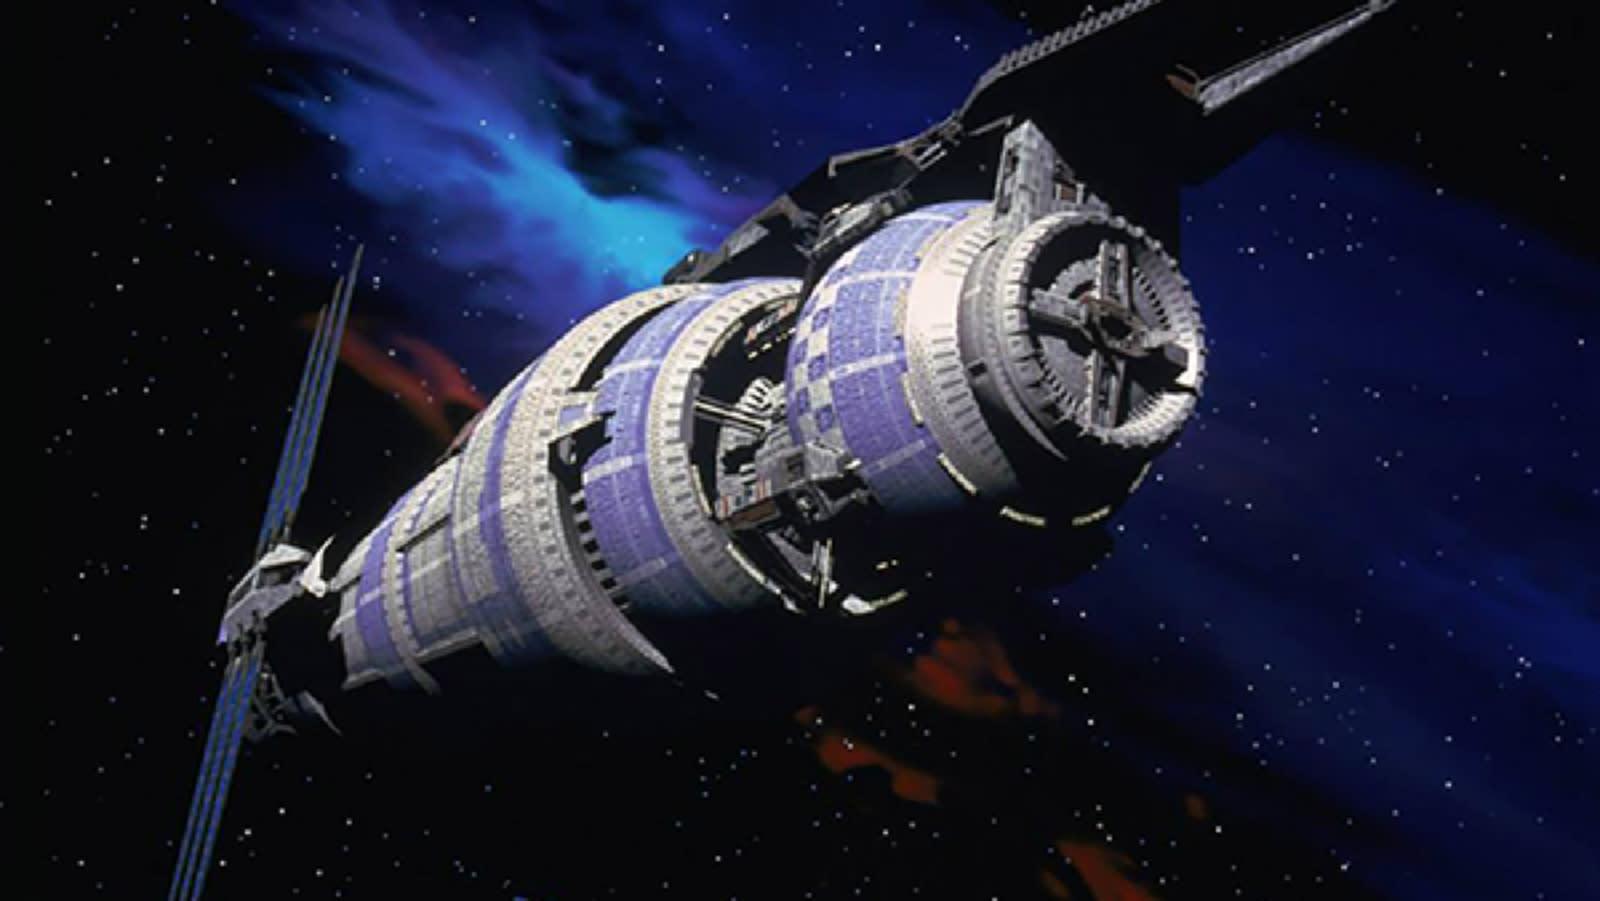 Warner Bros. Home Video / Babylonian Productions 'Babylon 5'